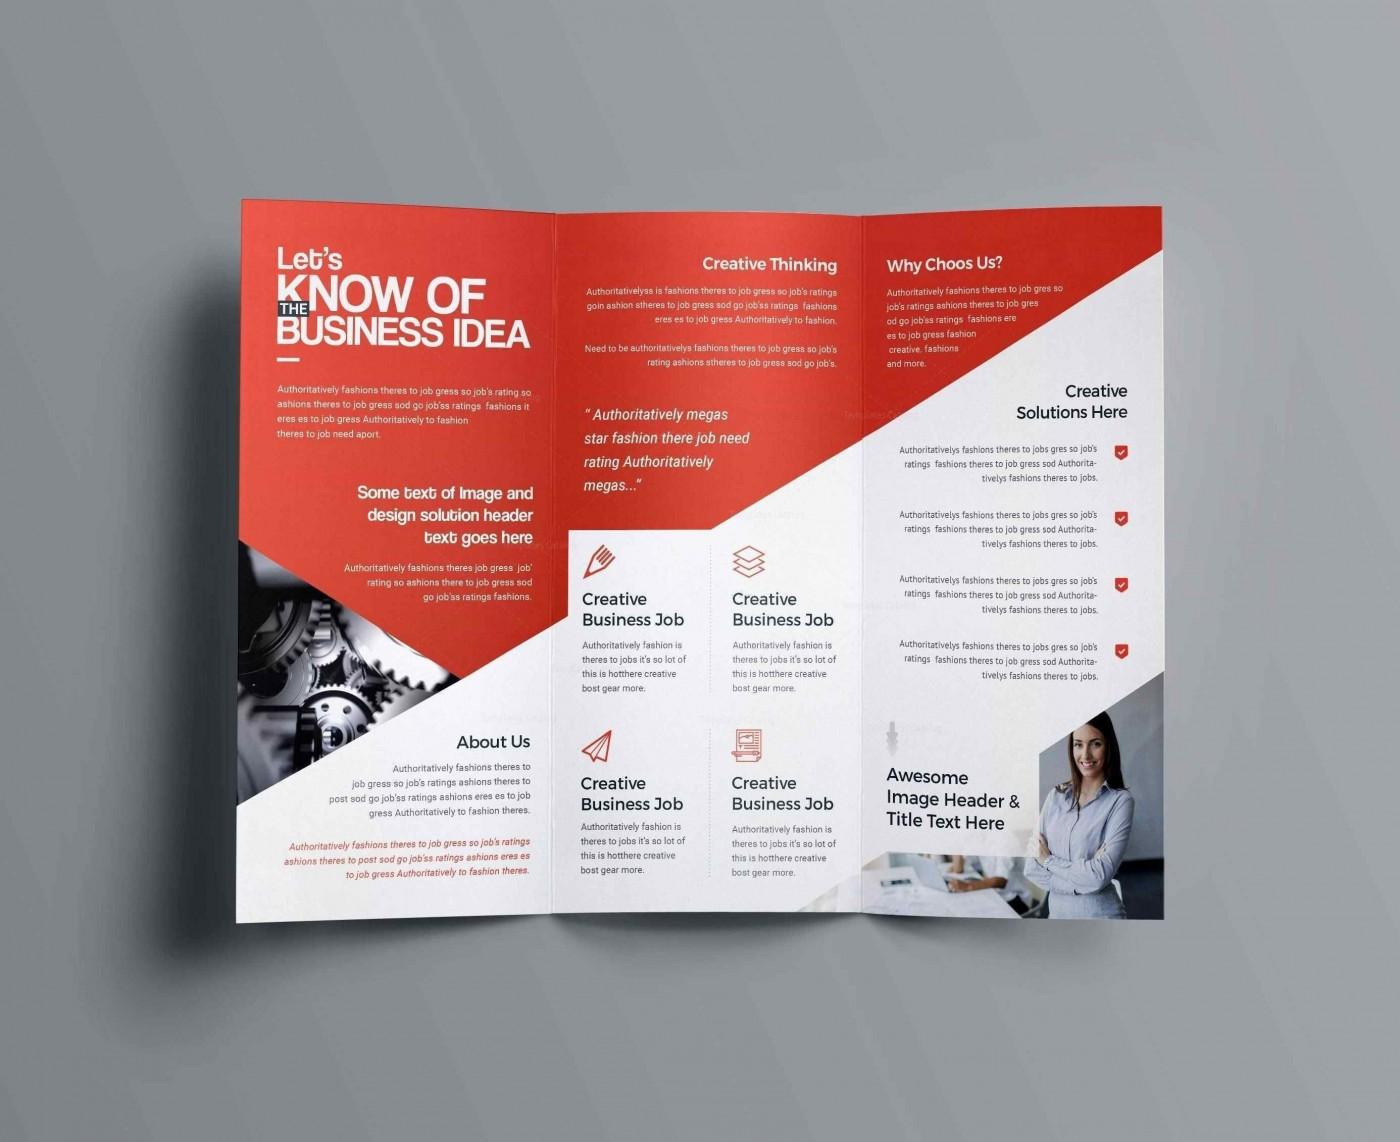 002 Surprising Busines Flyer Template Free Download High Resolution  Photoshop Training Design1400